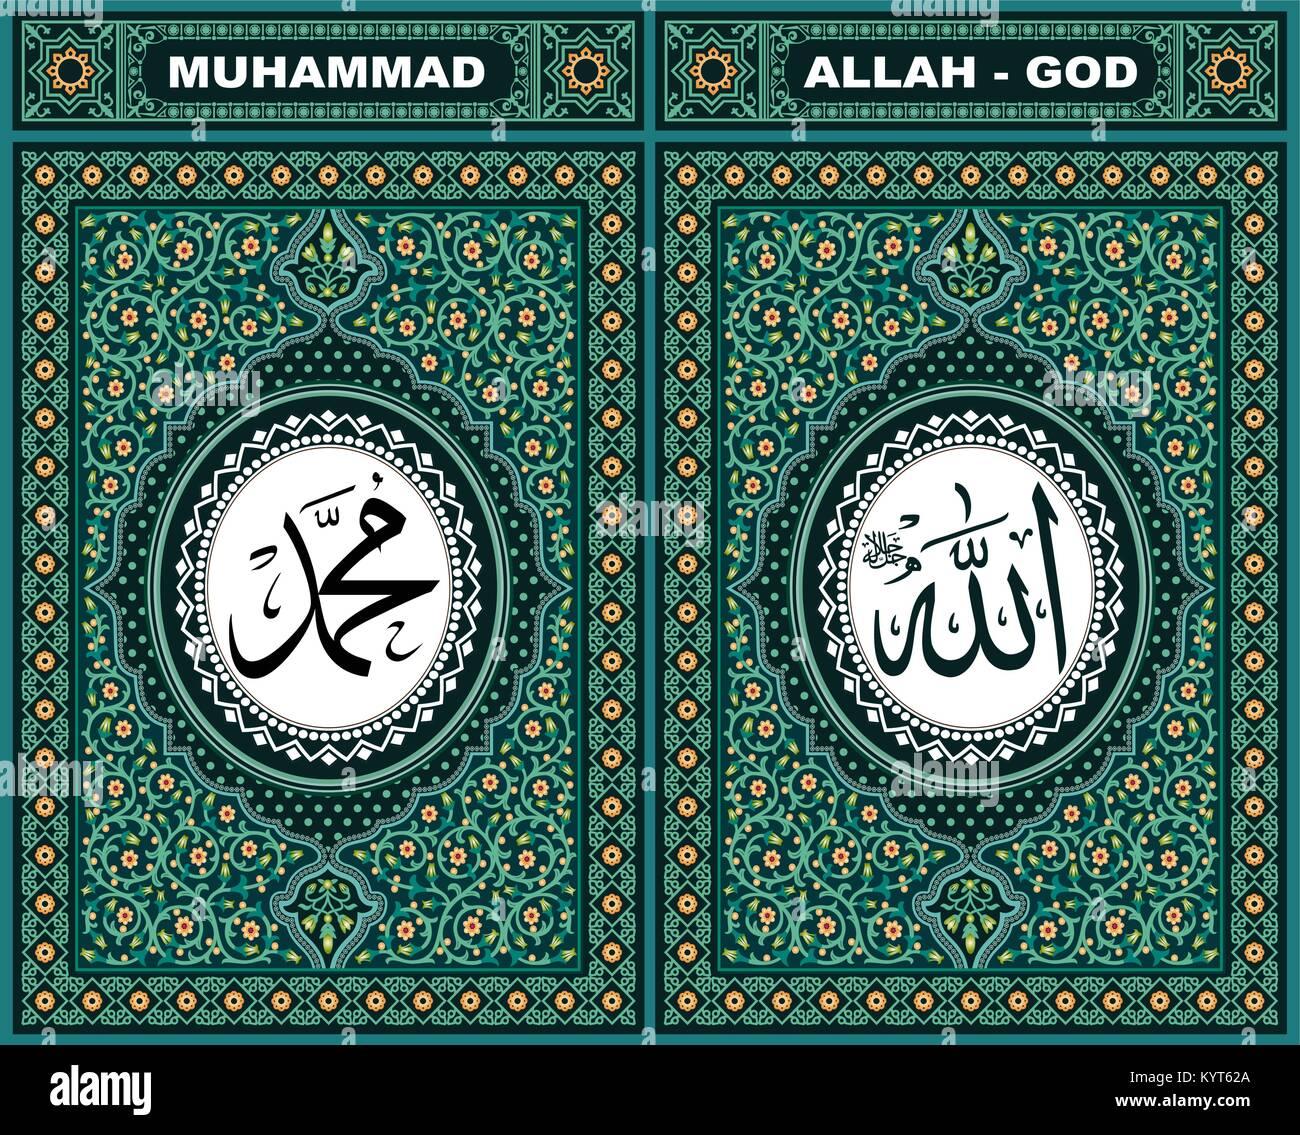 Islamic Calligraphy Frame Stock Photos & Islamic Calligraphy Frame ...